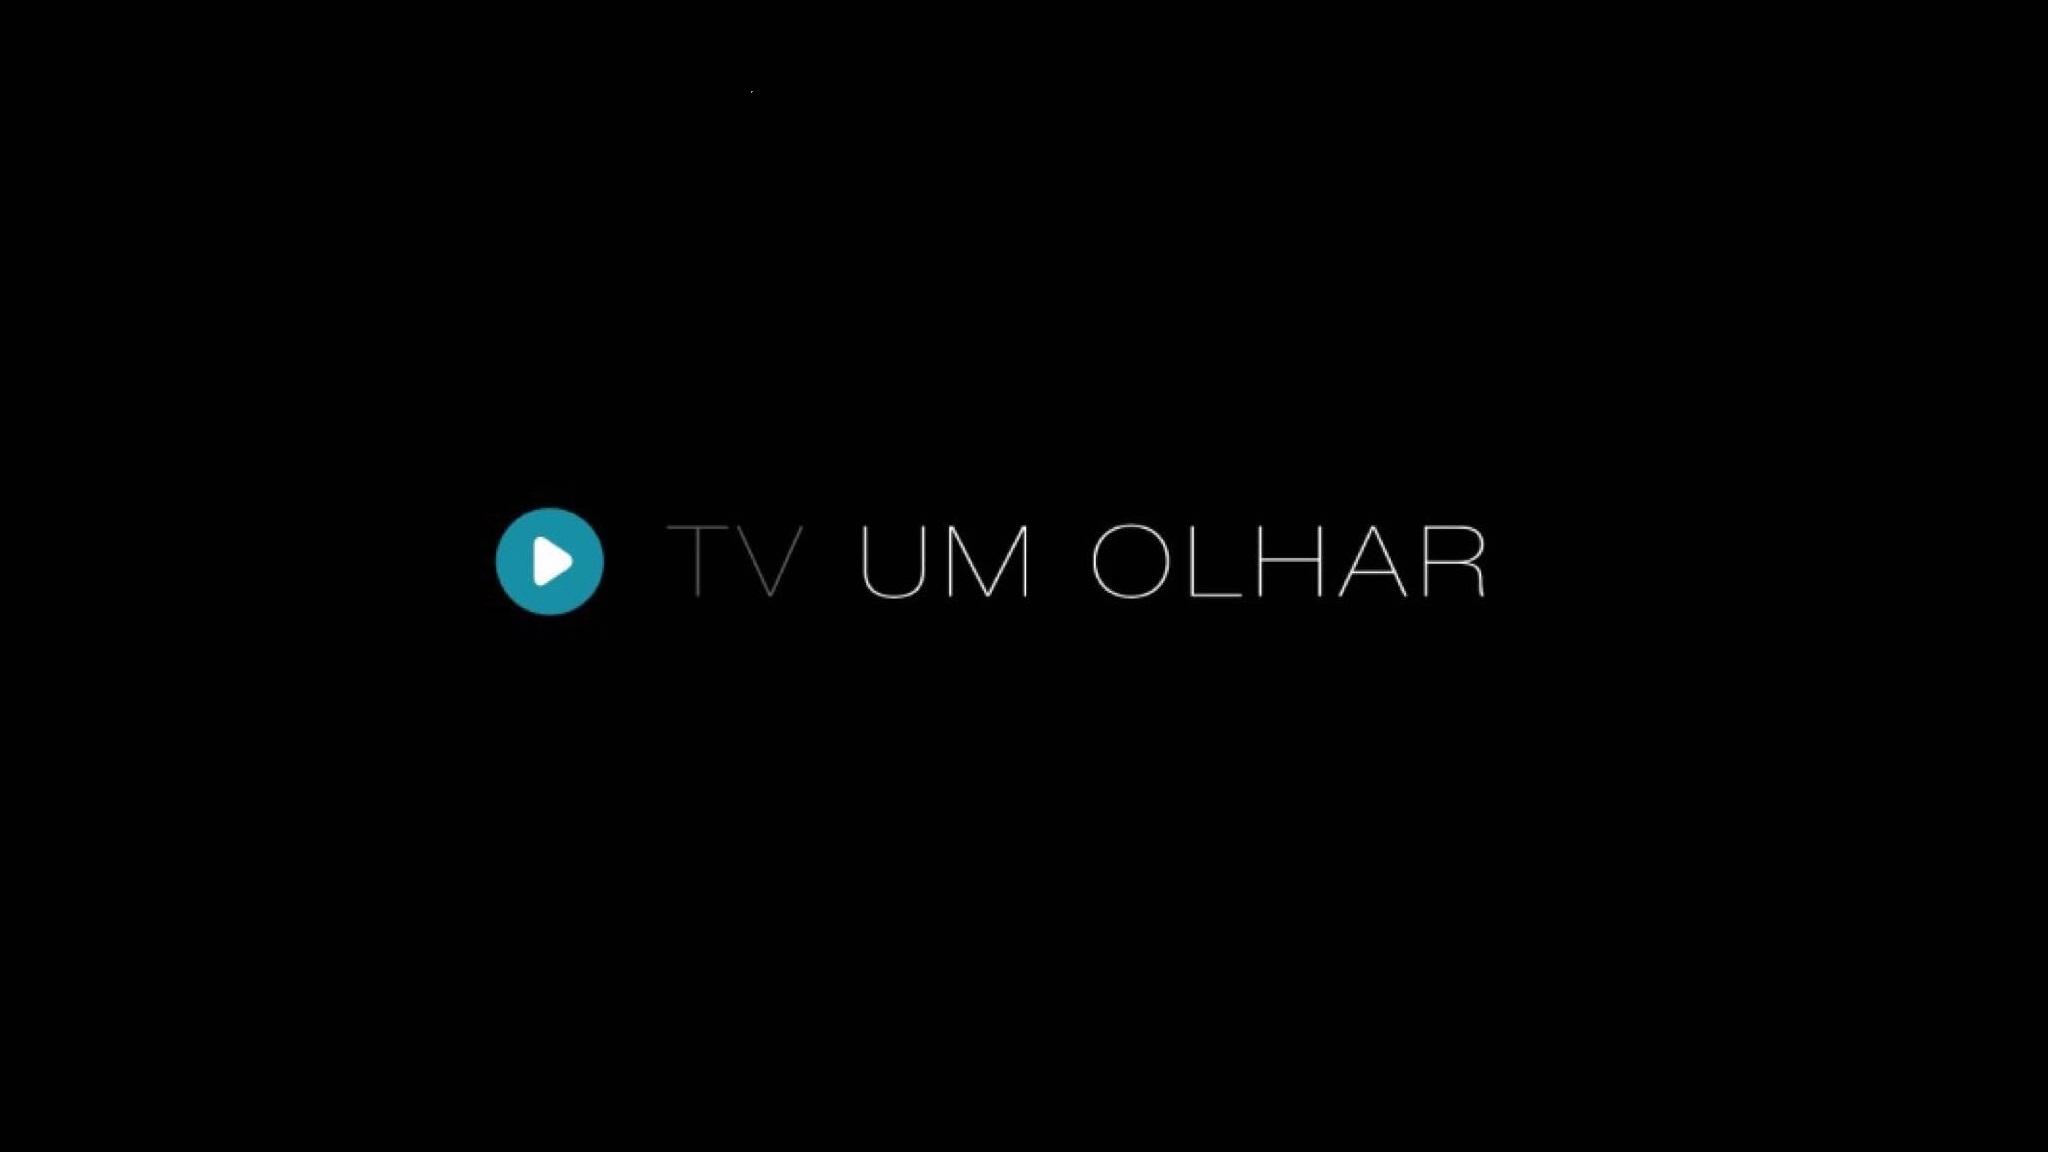 TV UM OLHAR